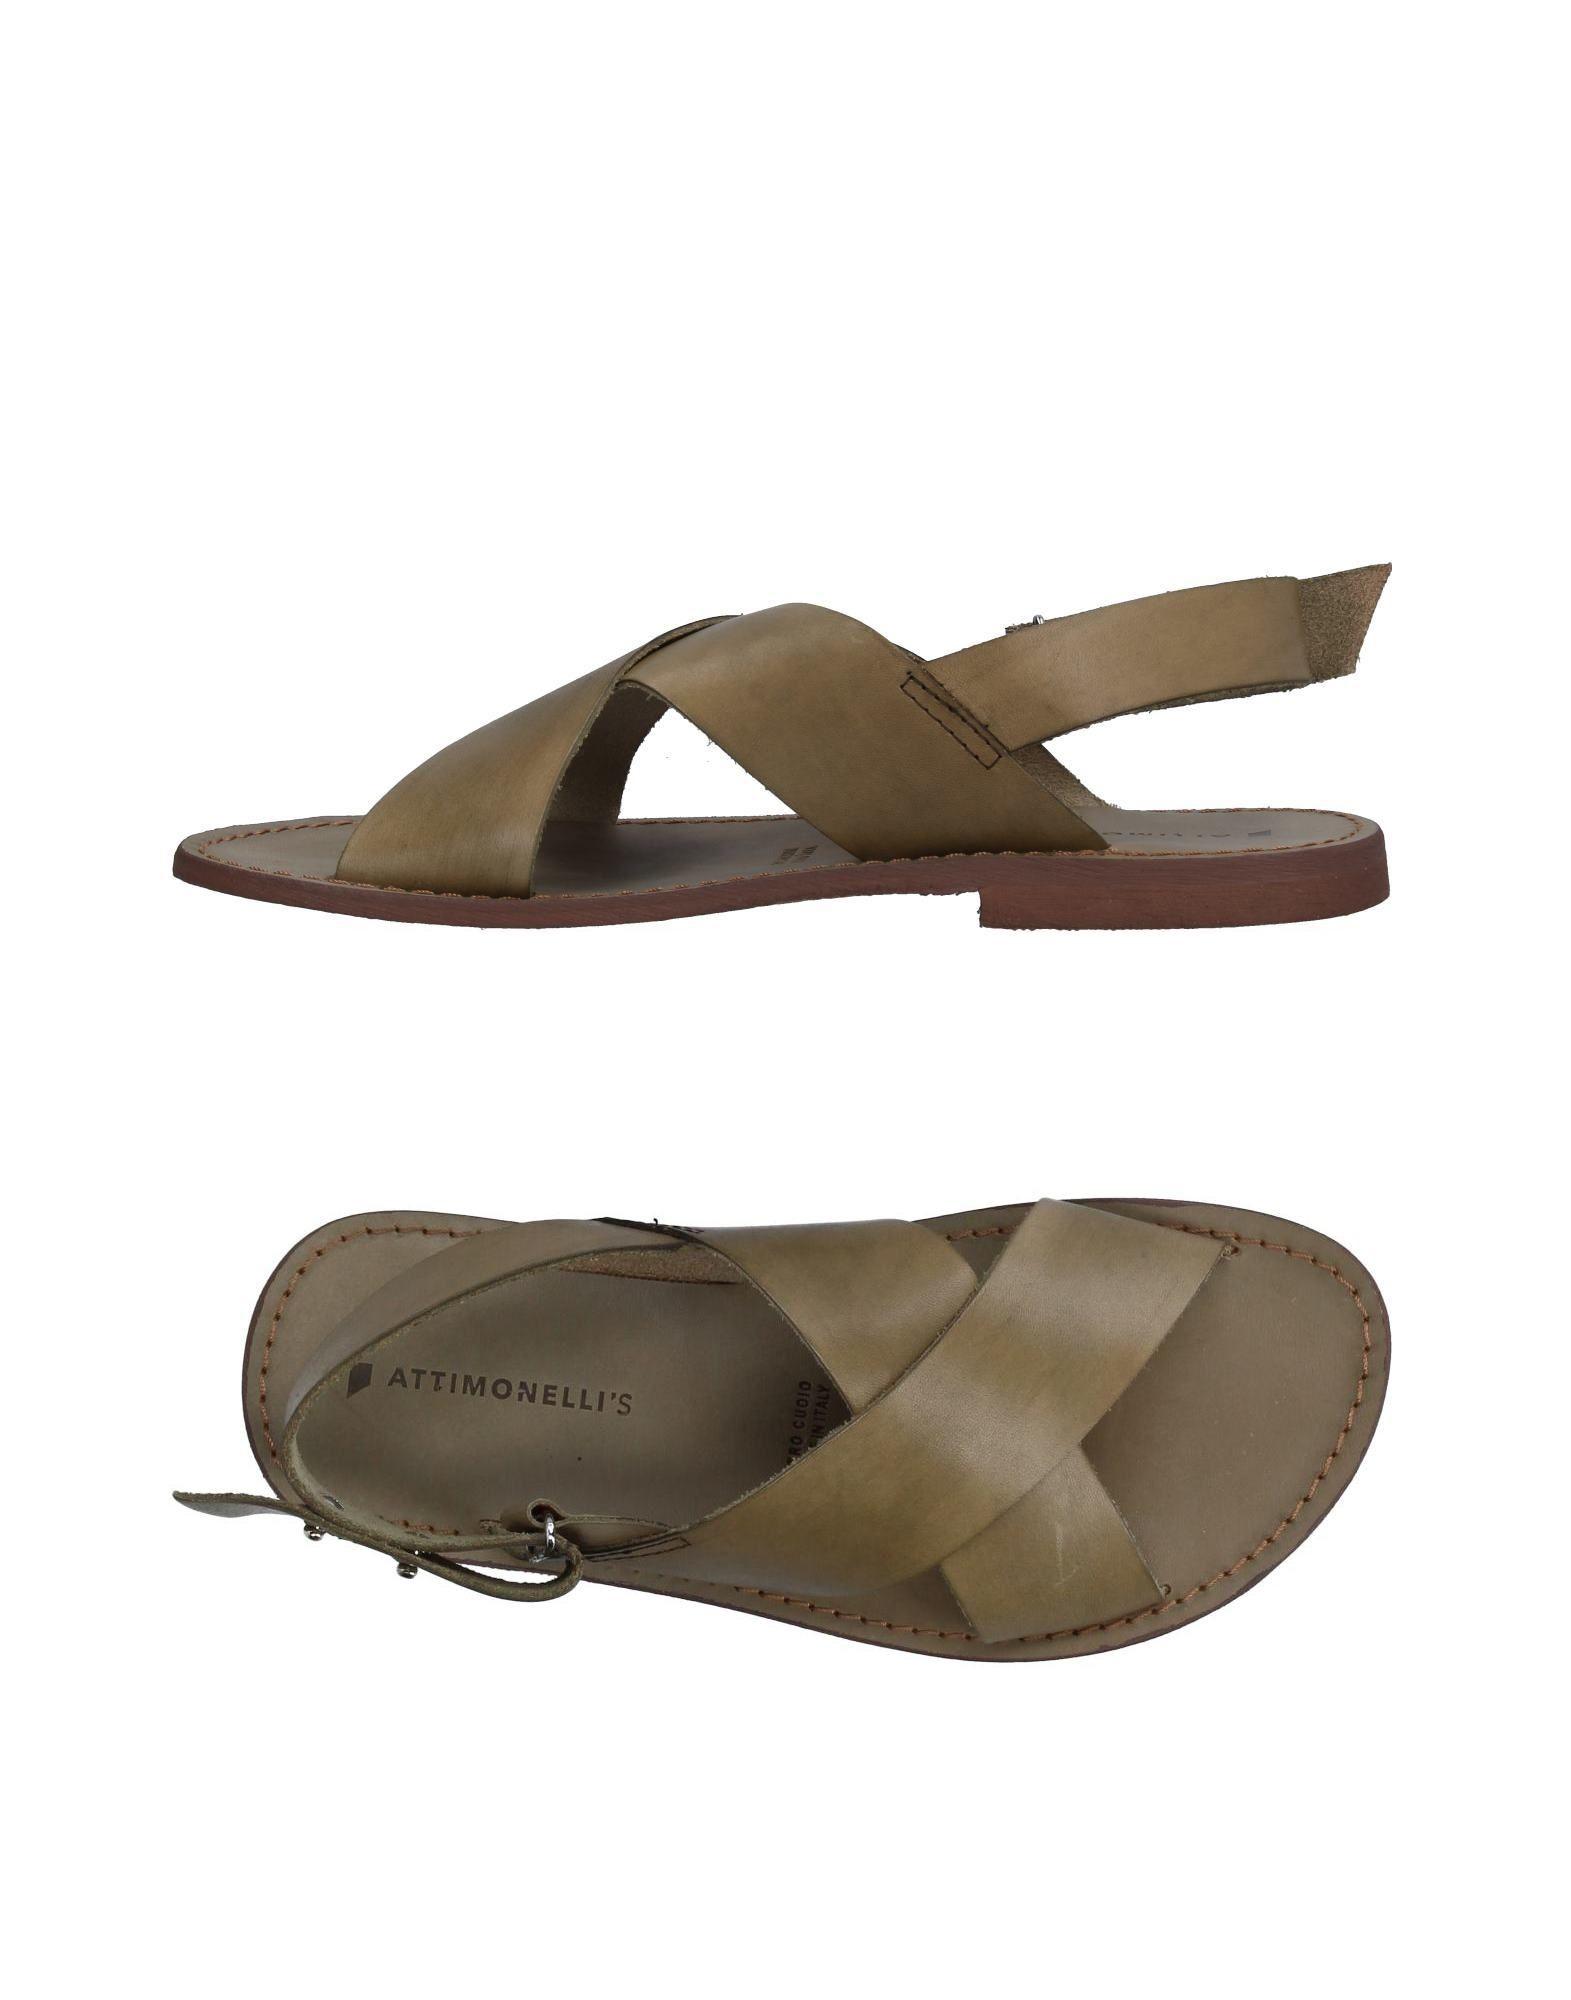 Rabatt echte Schuhe Attimonelli's Sandalen Herren  11332442JX